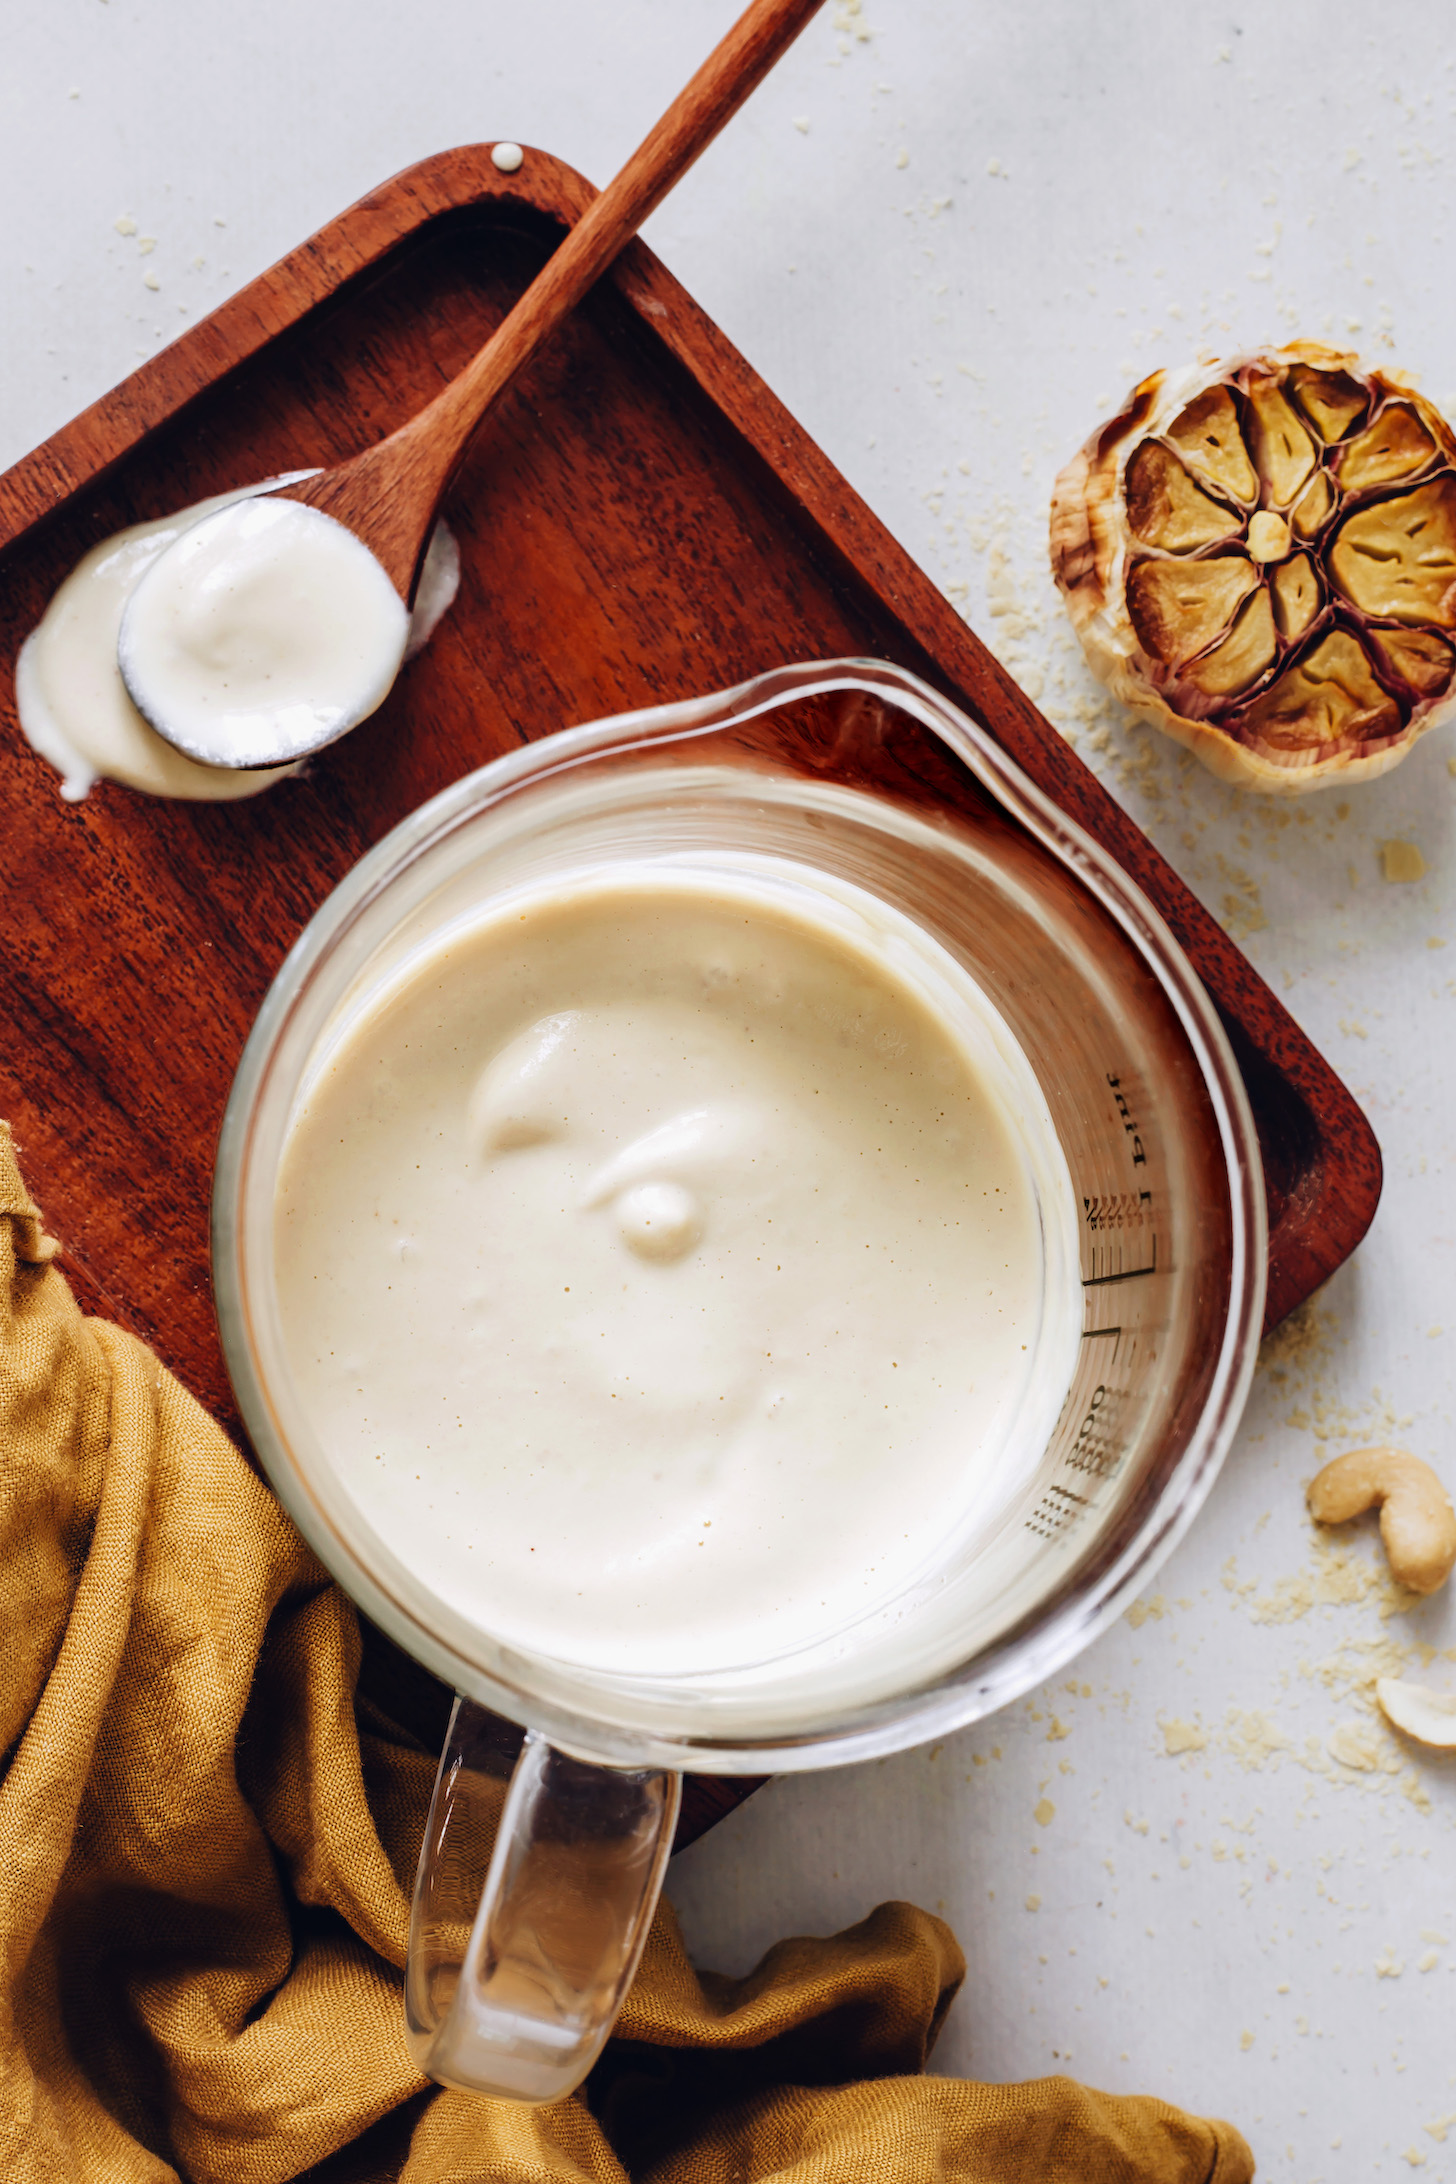 Roasted garlic, cashews, nutritional yeast, and homemade vegan bechamel sauce